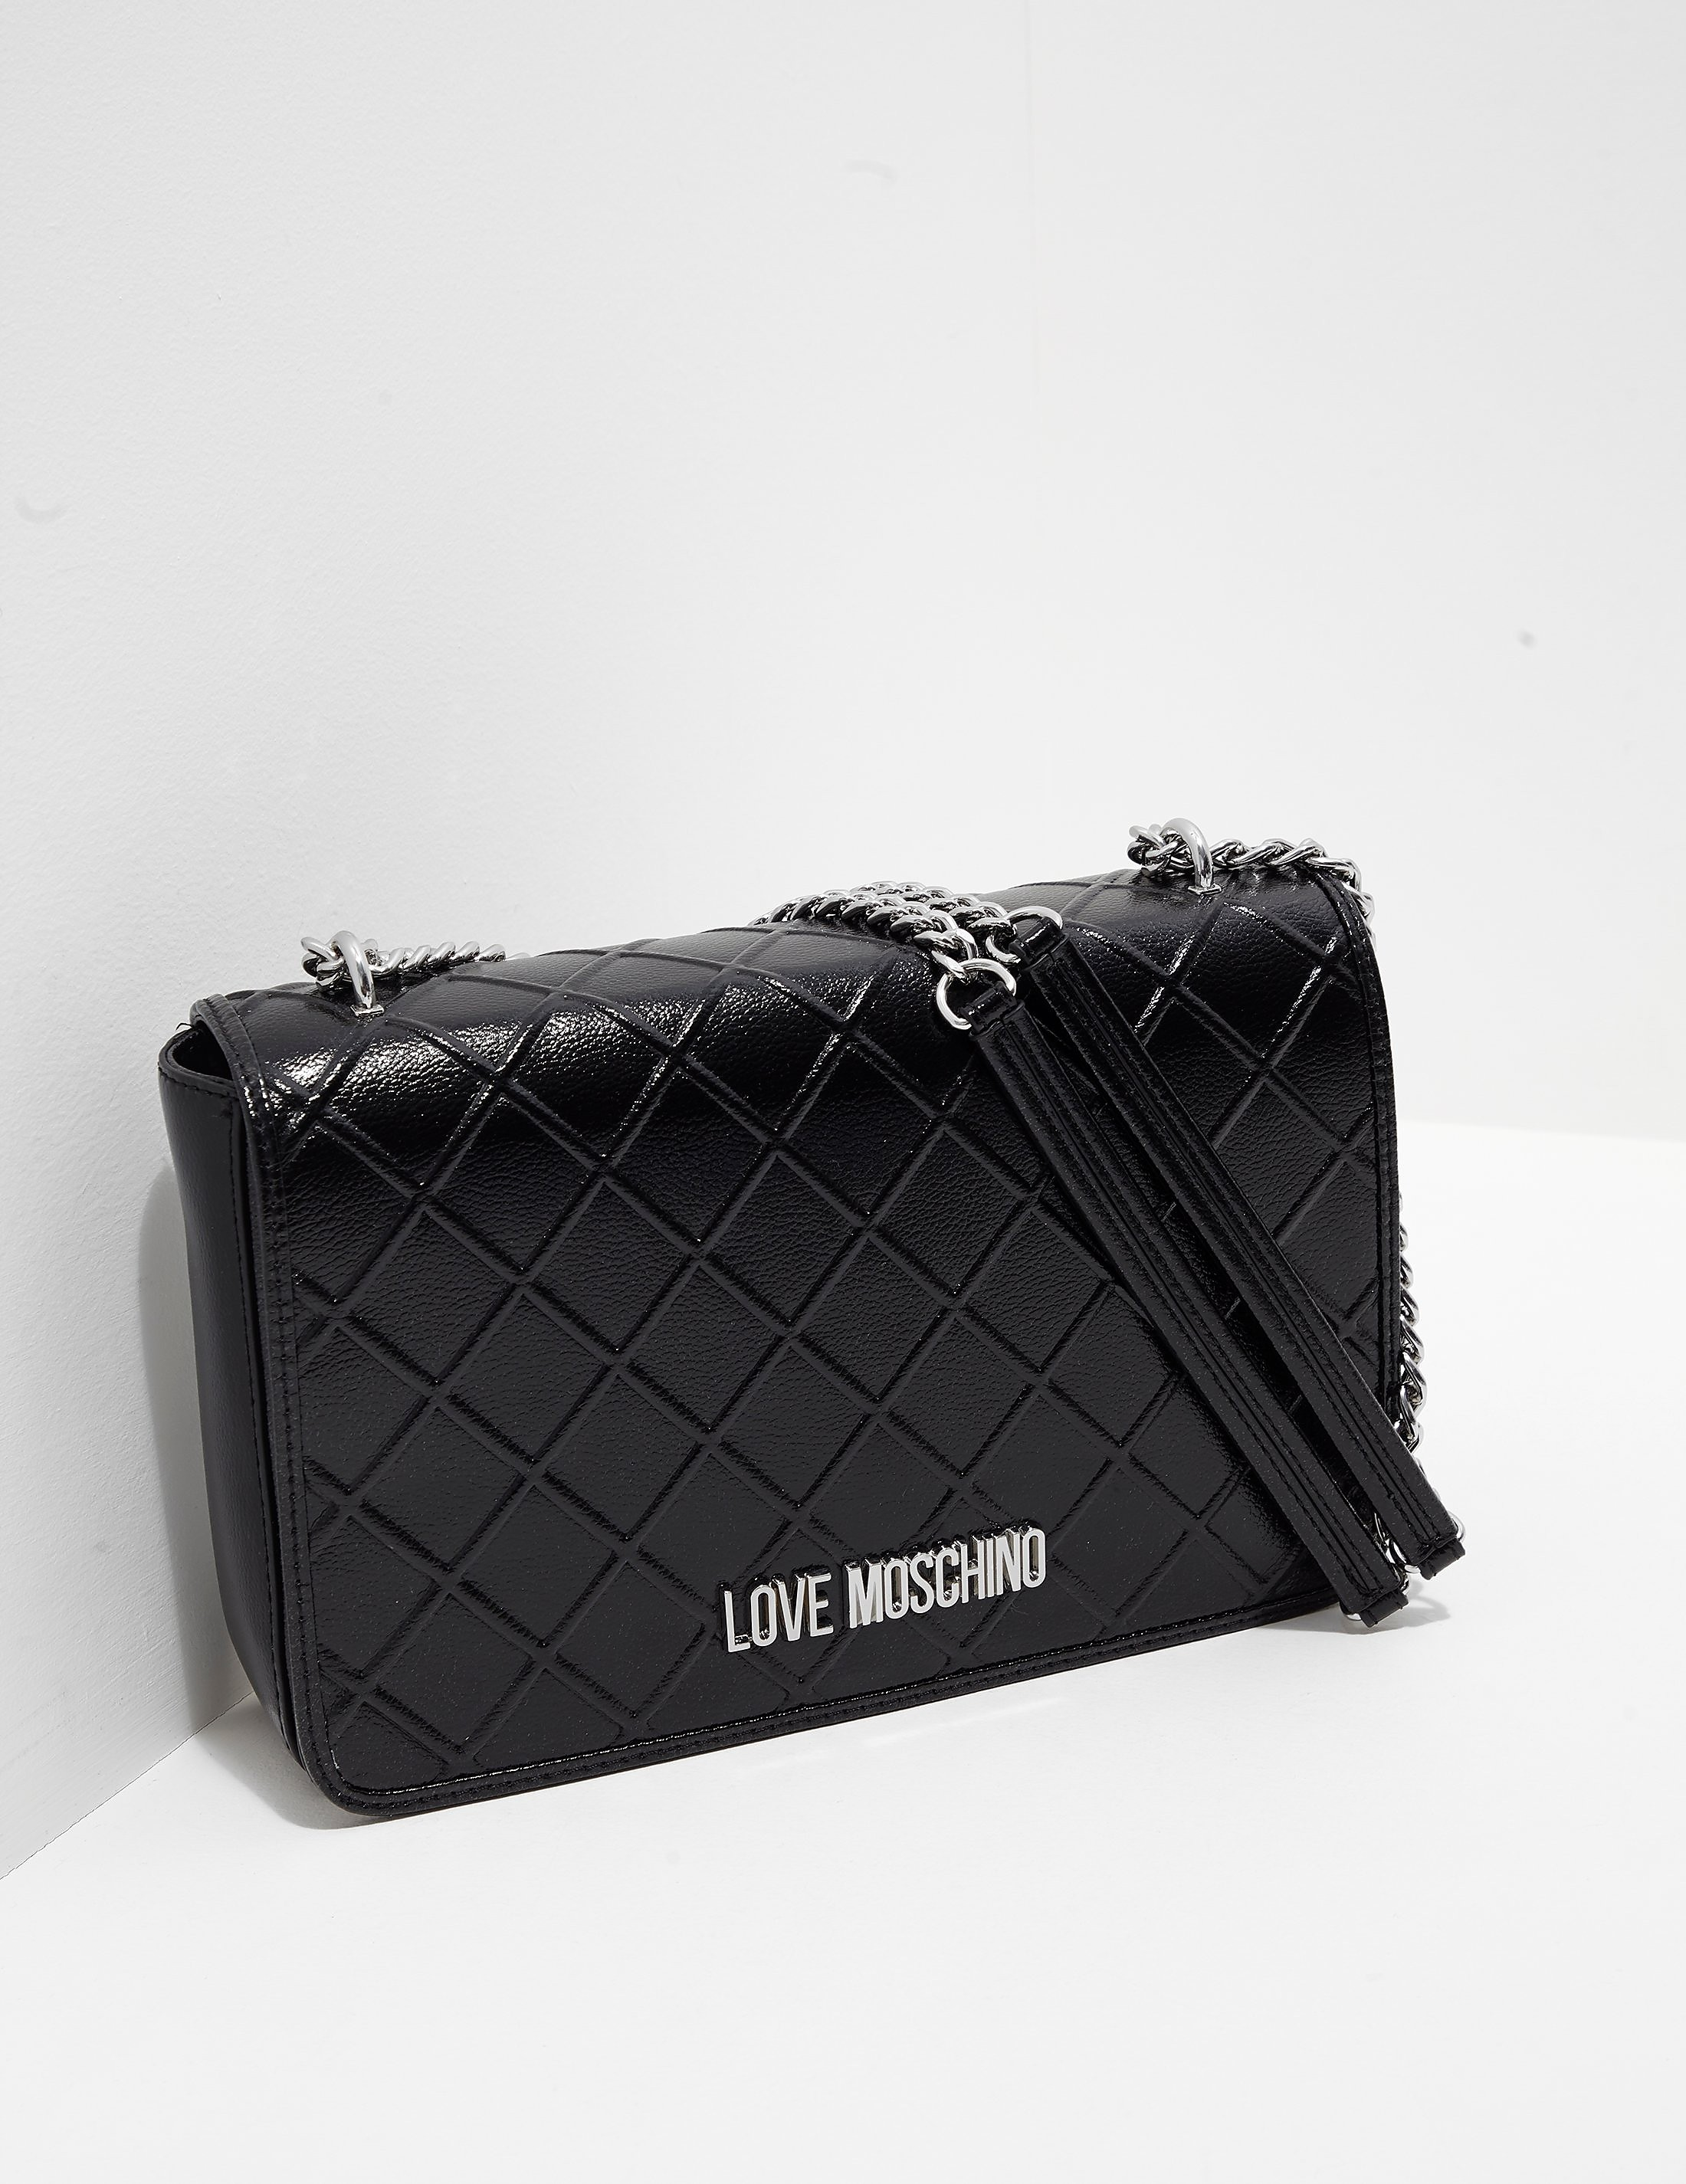 Love Moschino Quilt Chain Shoulder Bag